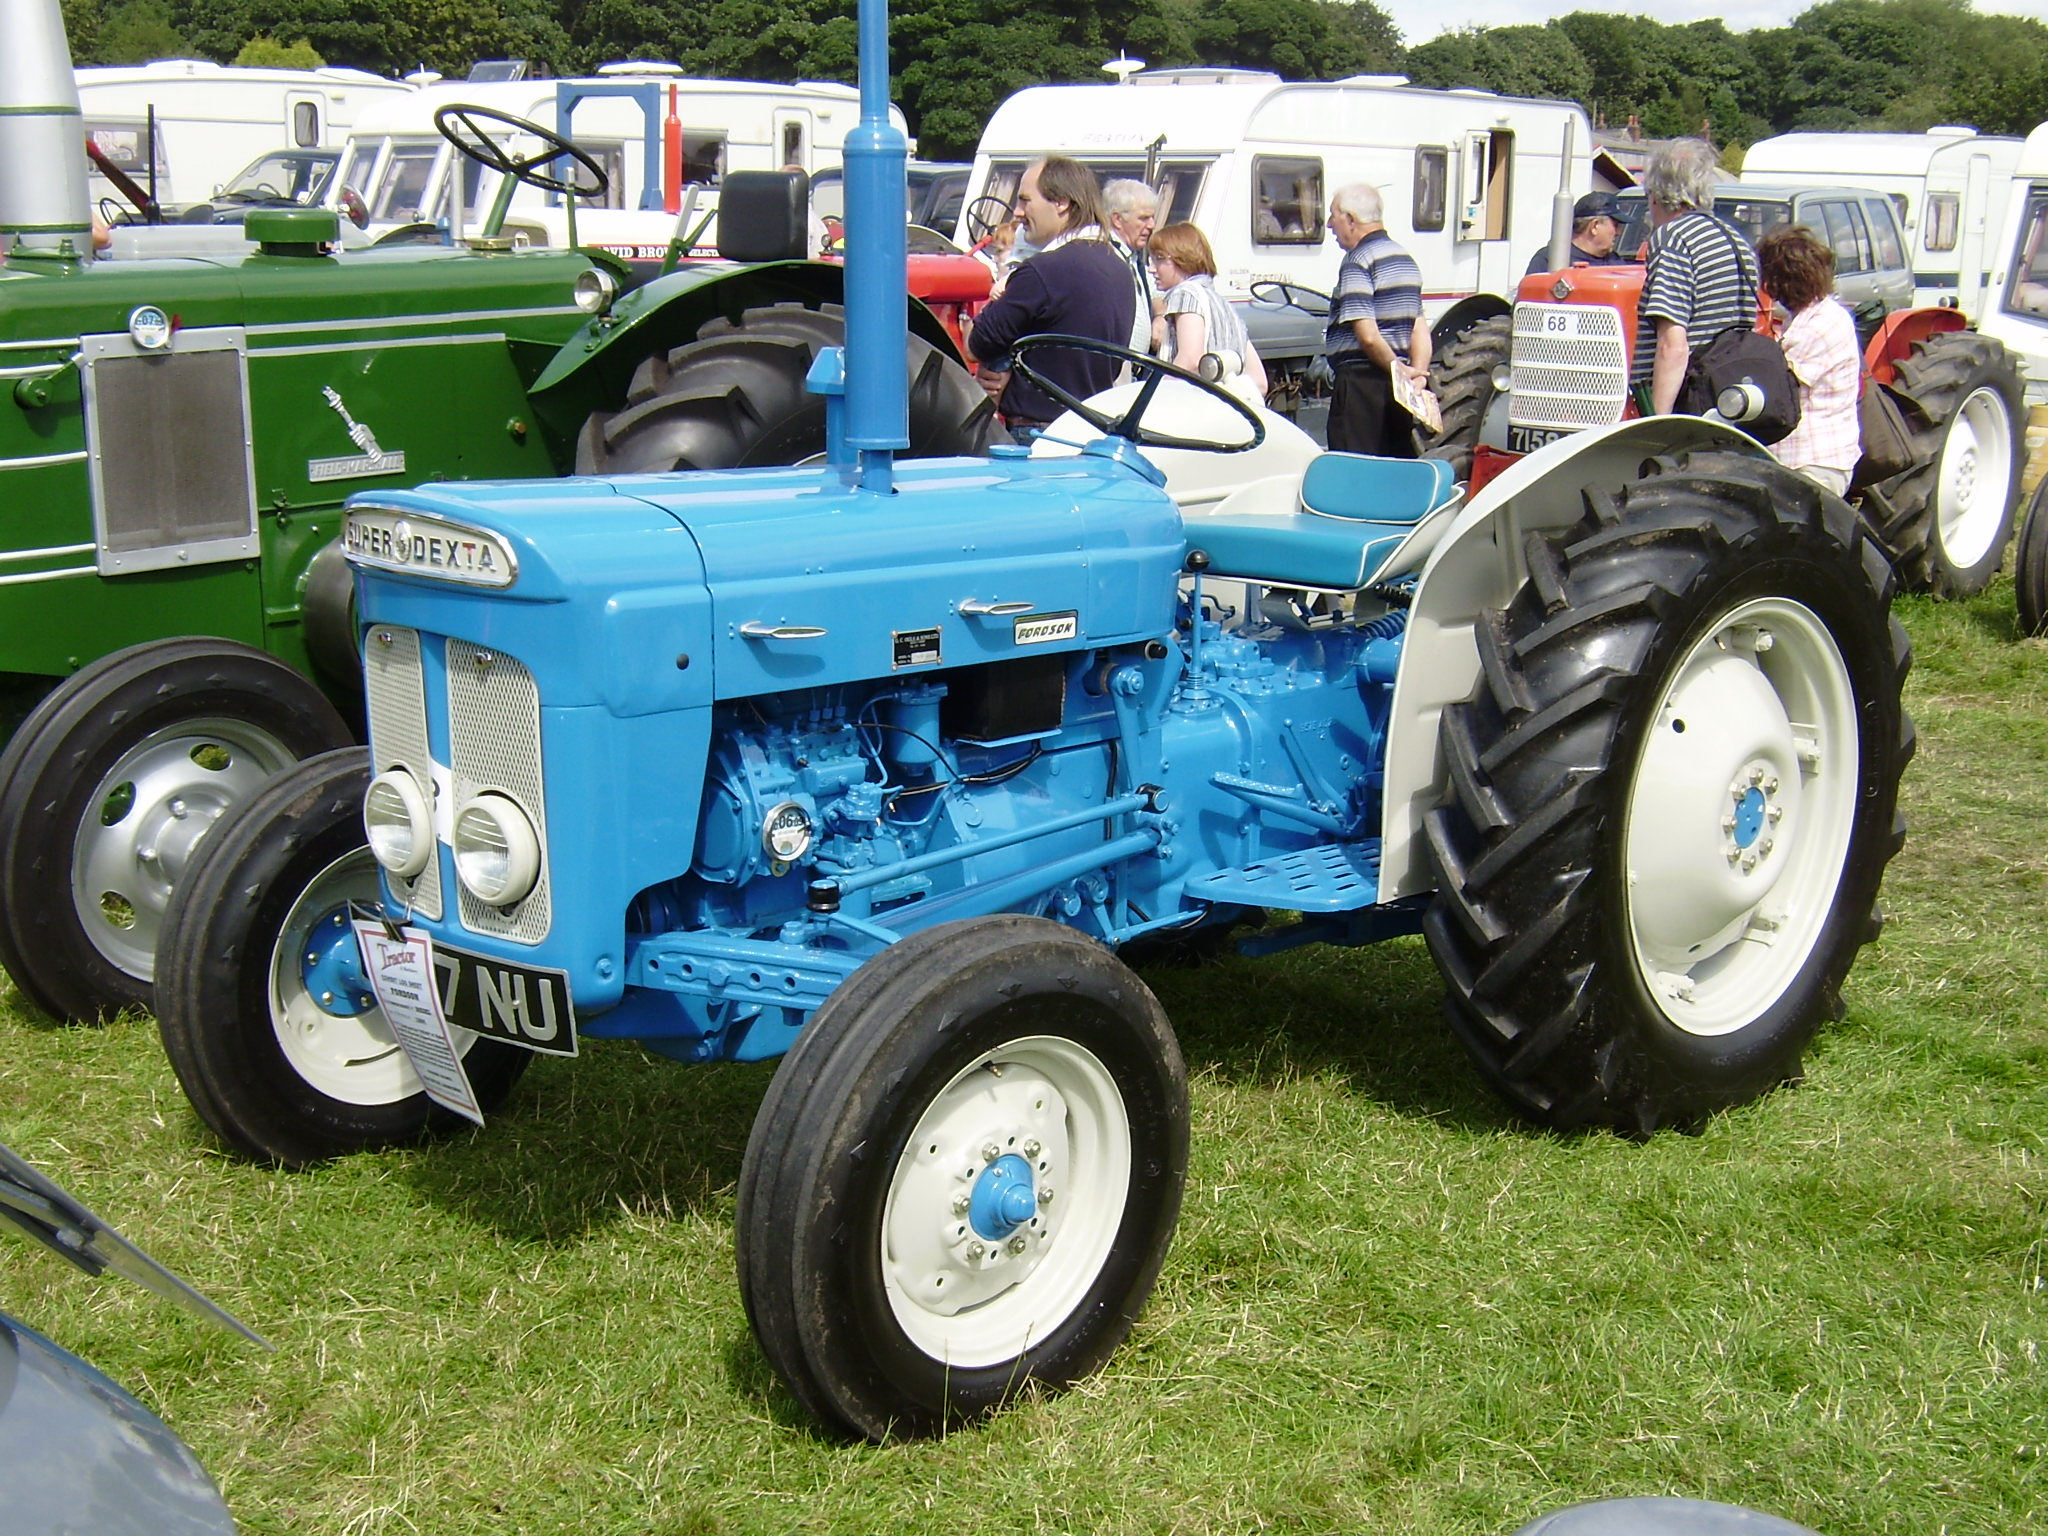 fordson super dexta tractor construction plant wiki fandom rh tractors wikia com fordson super dexta tractor data fordson super dexta tractors for sale